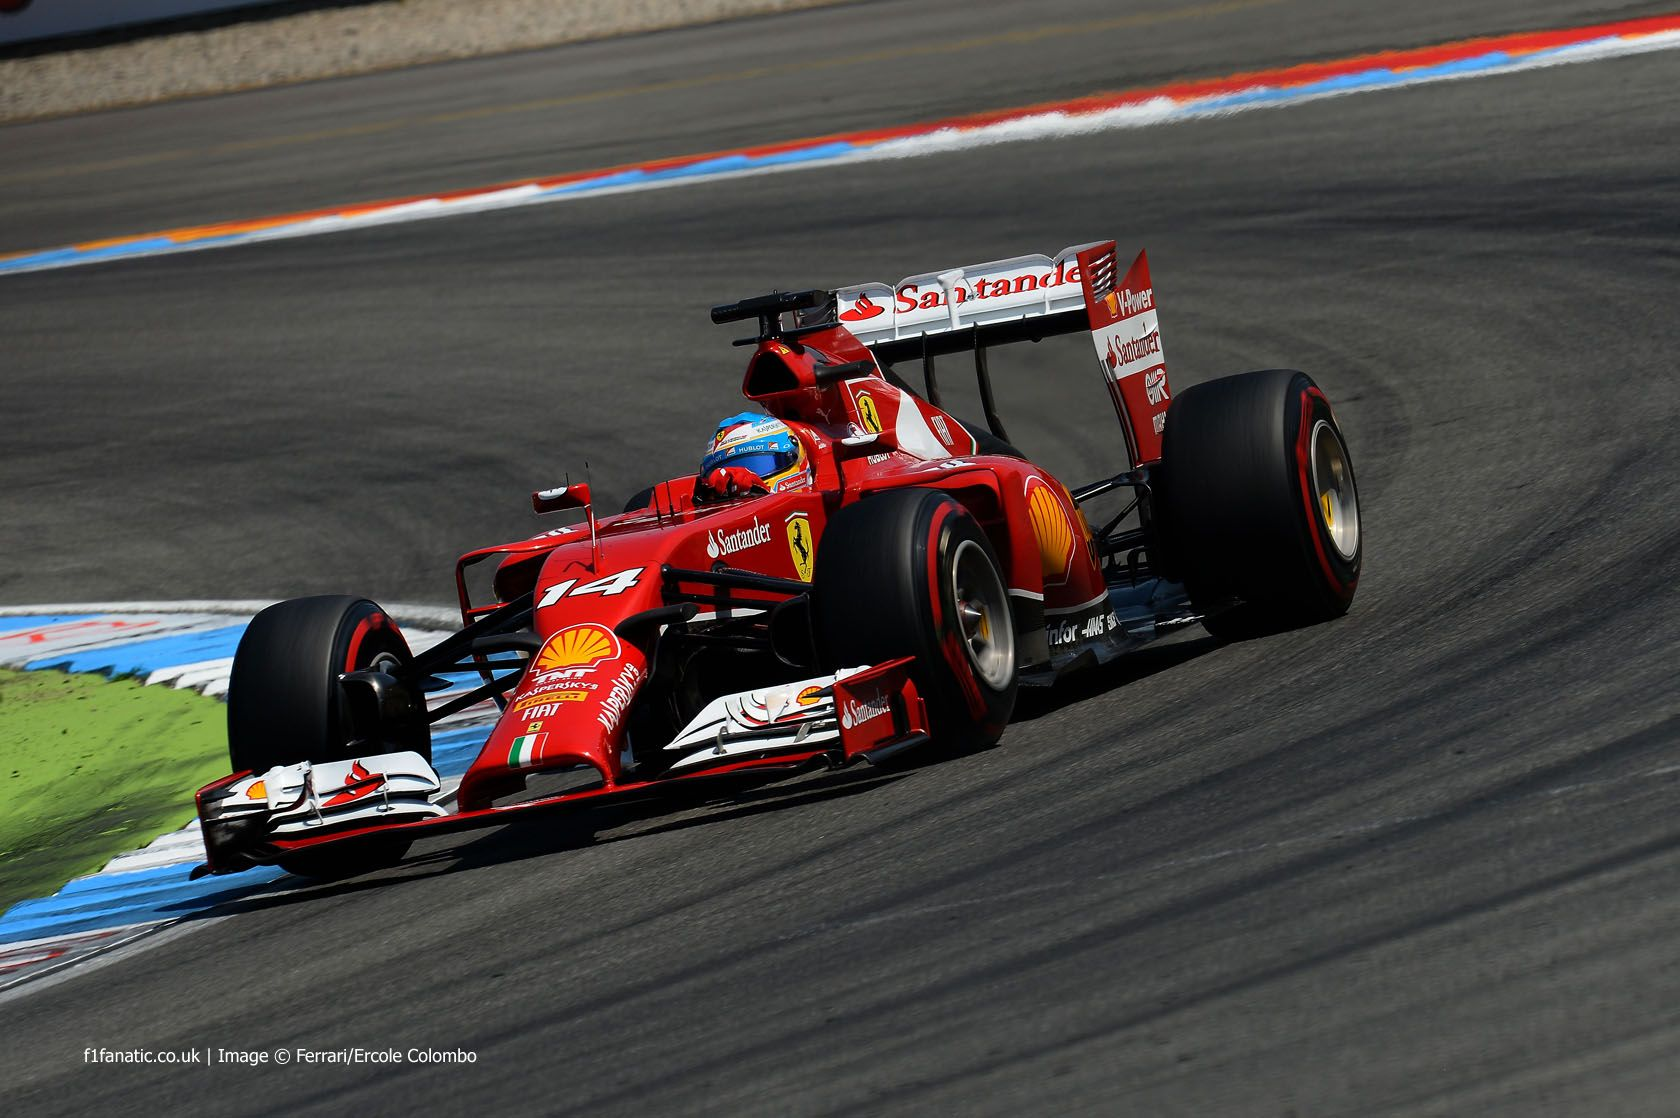 Fernando Alonso, Ferrari, Hockenheimring, Saturday, 2014